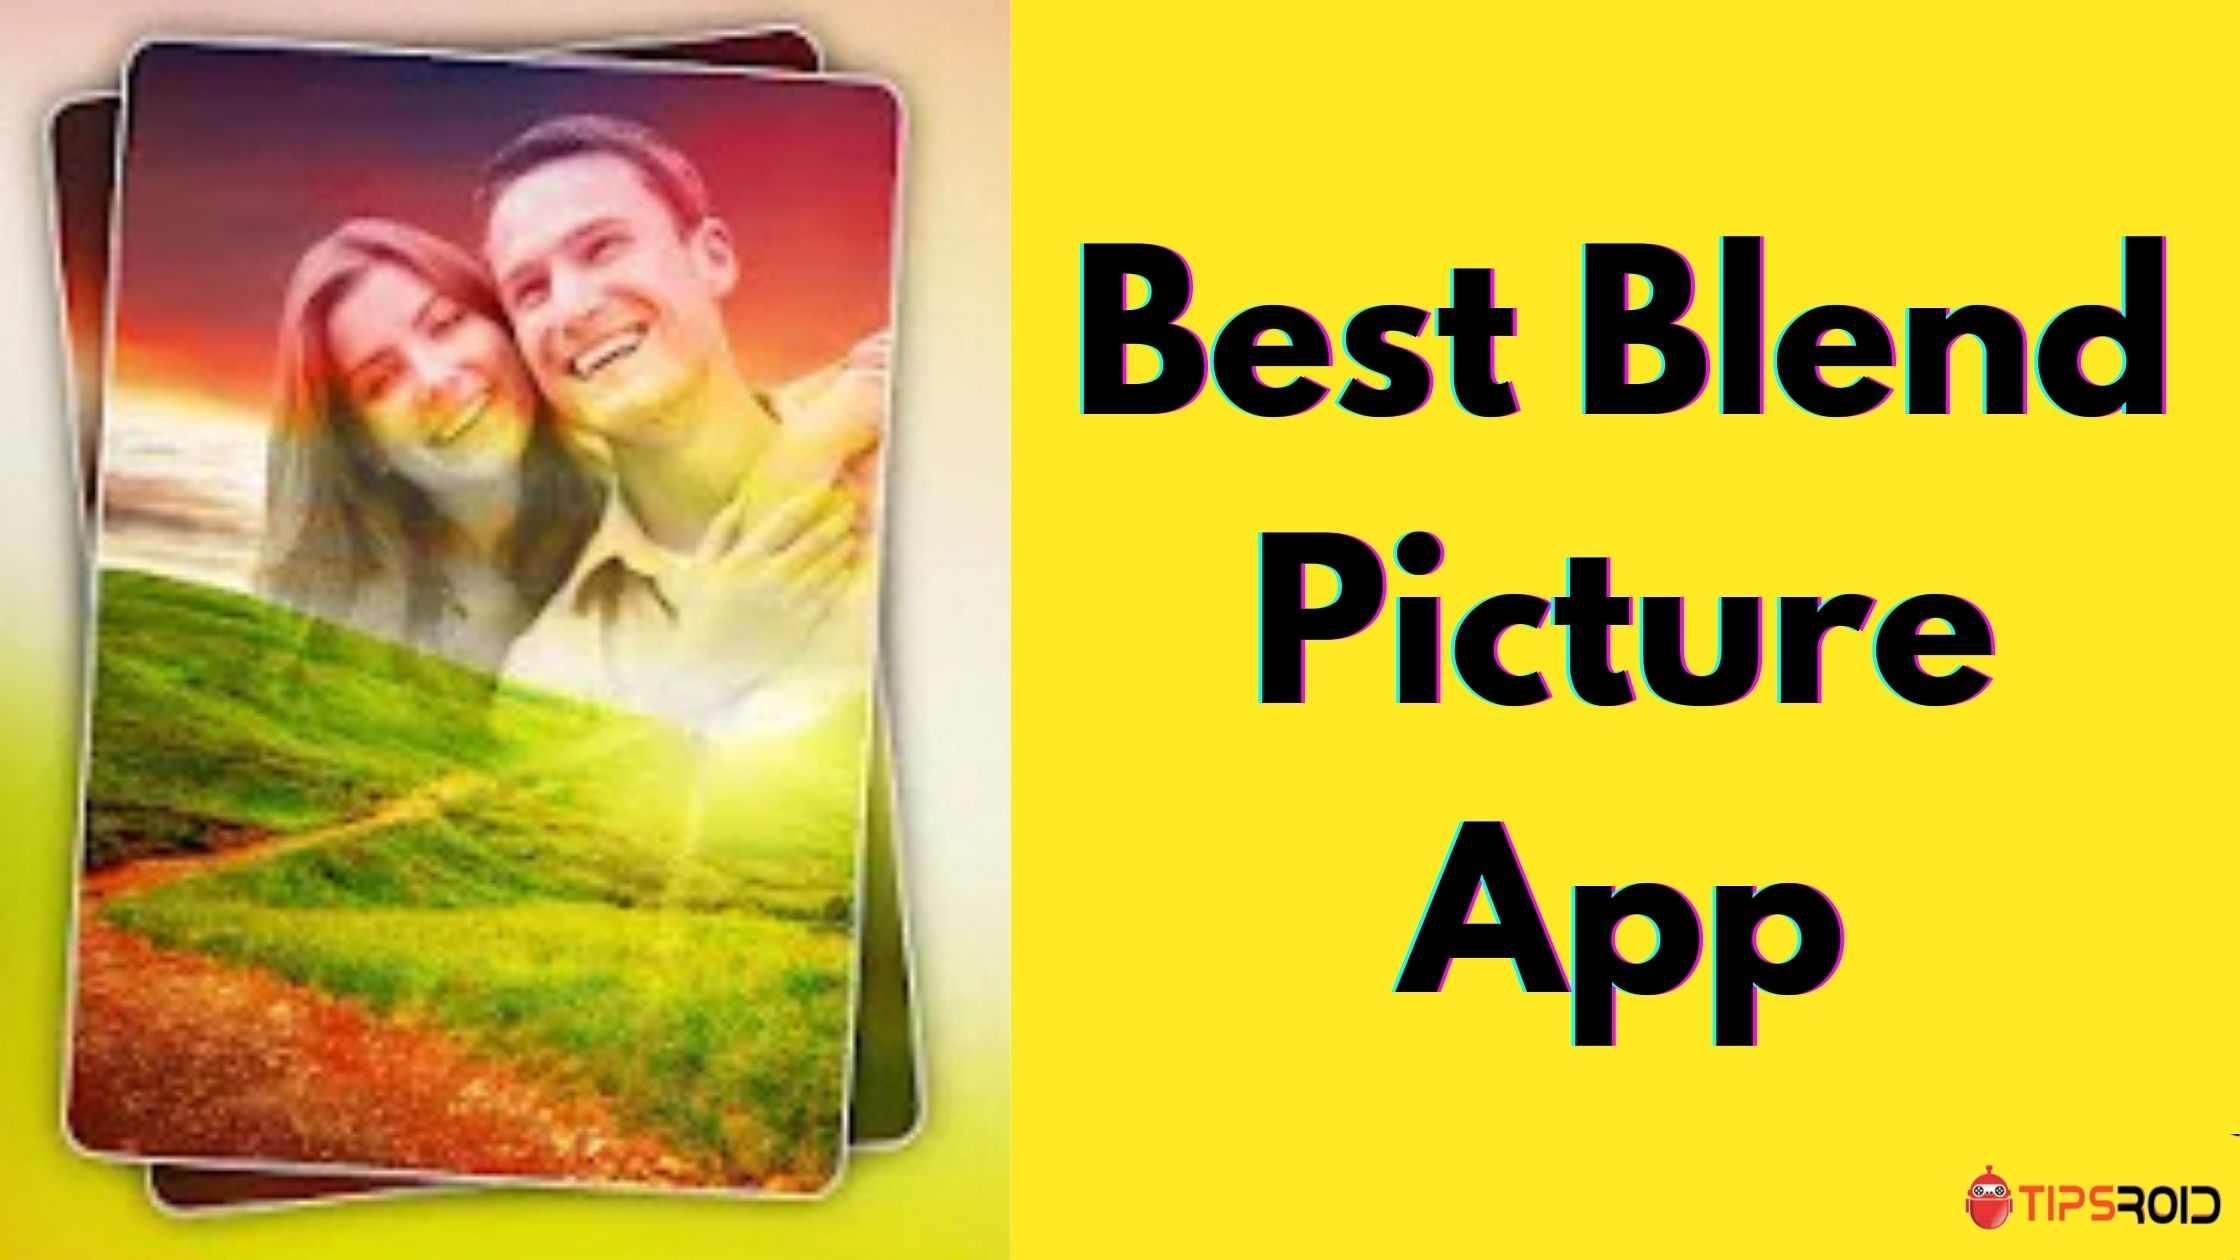 Blend Picture App